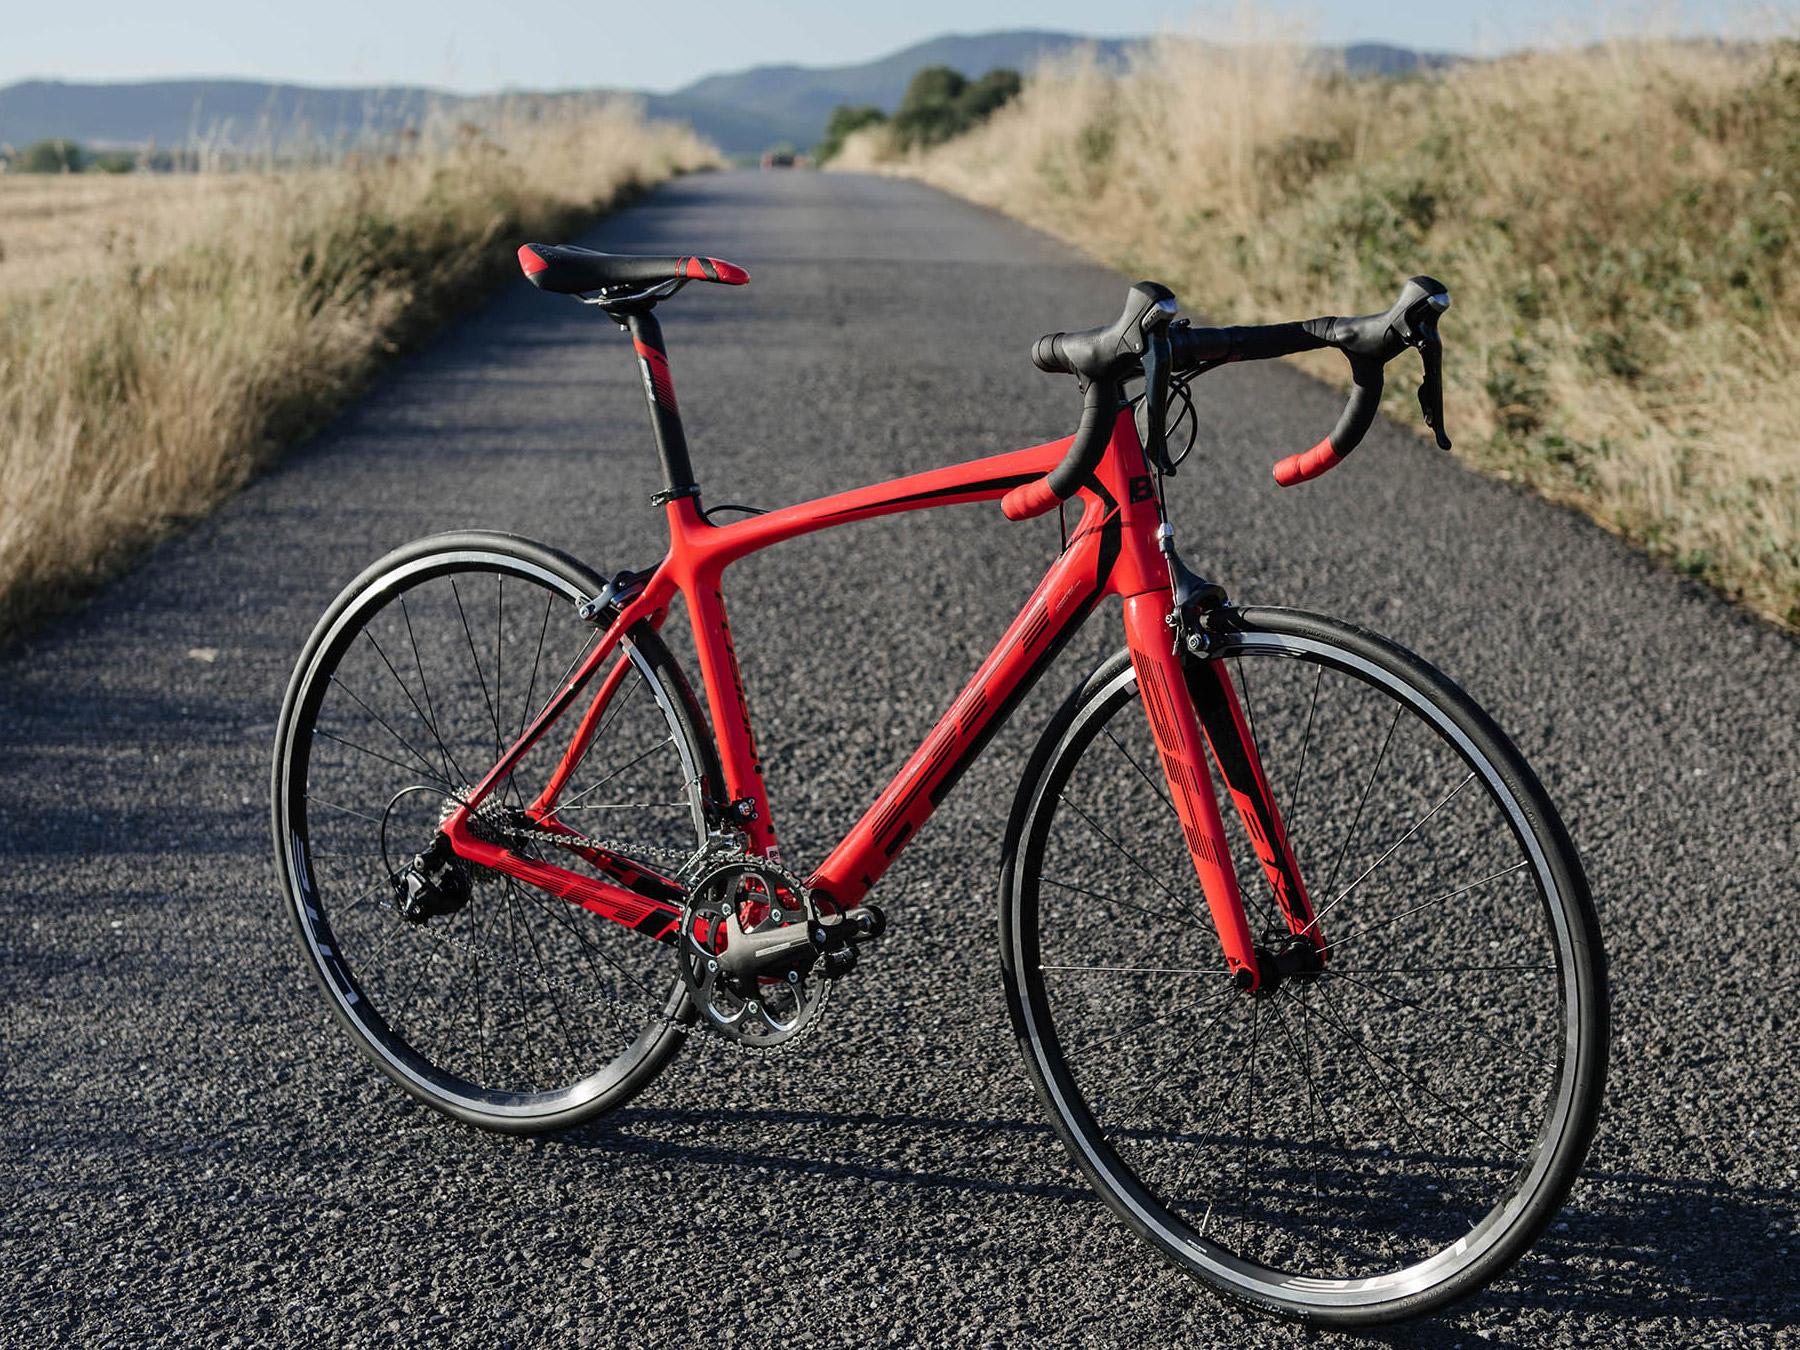 Capovelo Com Bh Launches New Fusion Range Of Endurance Bikes